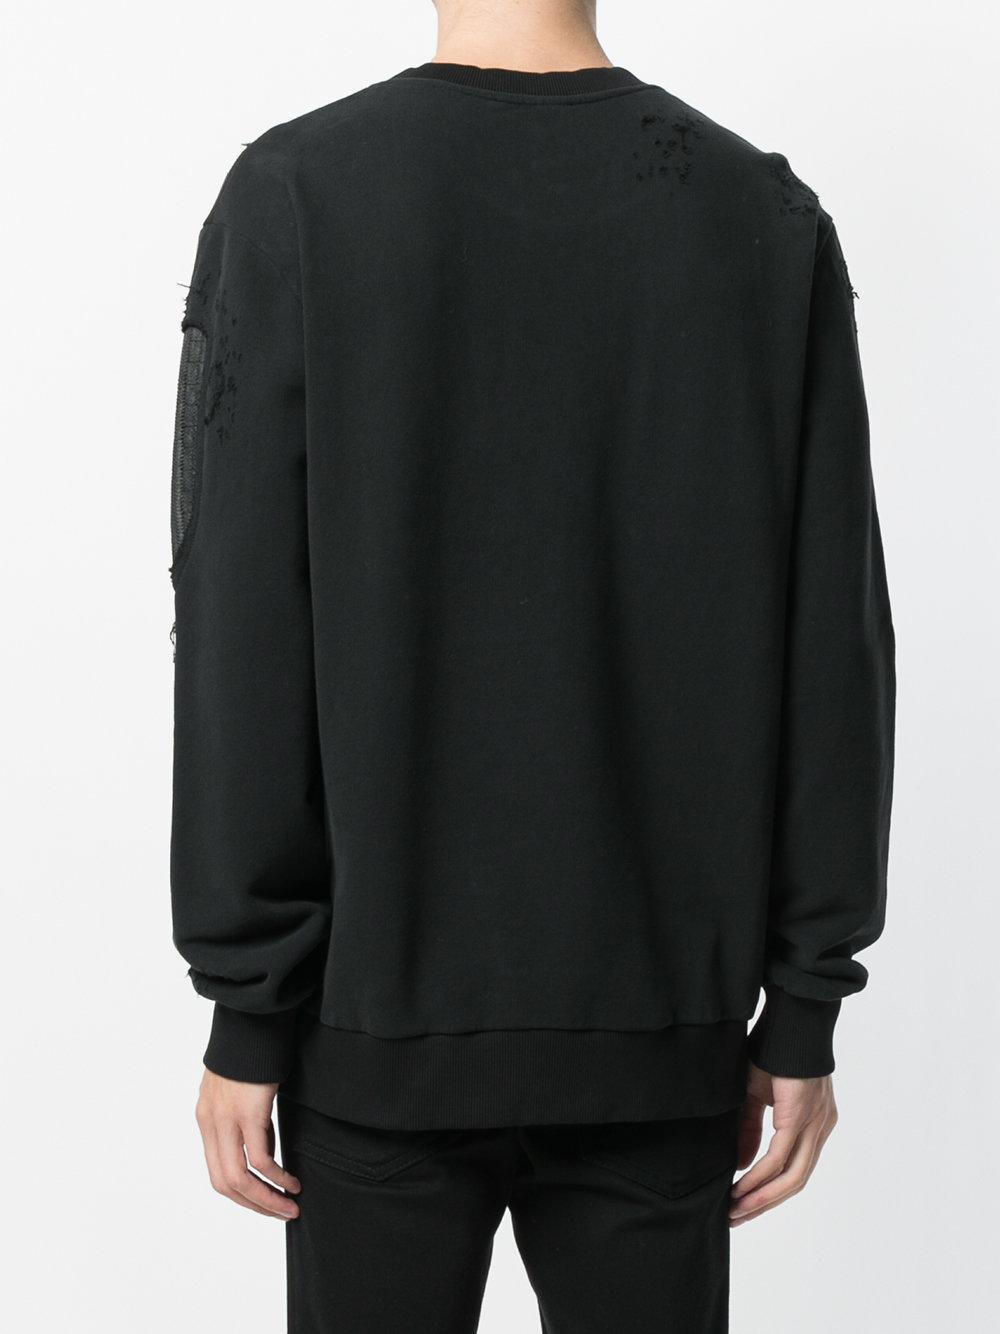 RH45 Cotton Printed Long Sleeve Jumper in Black for Men